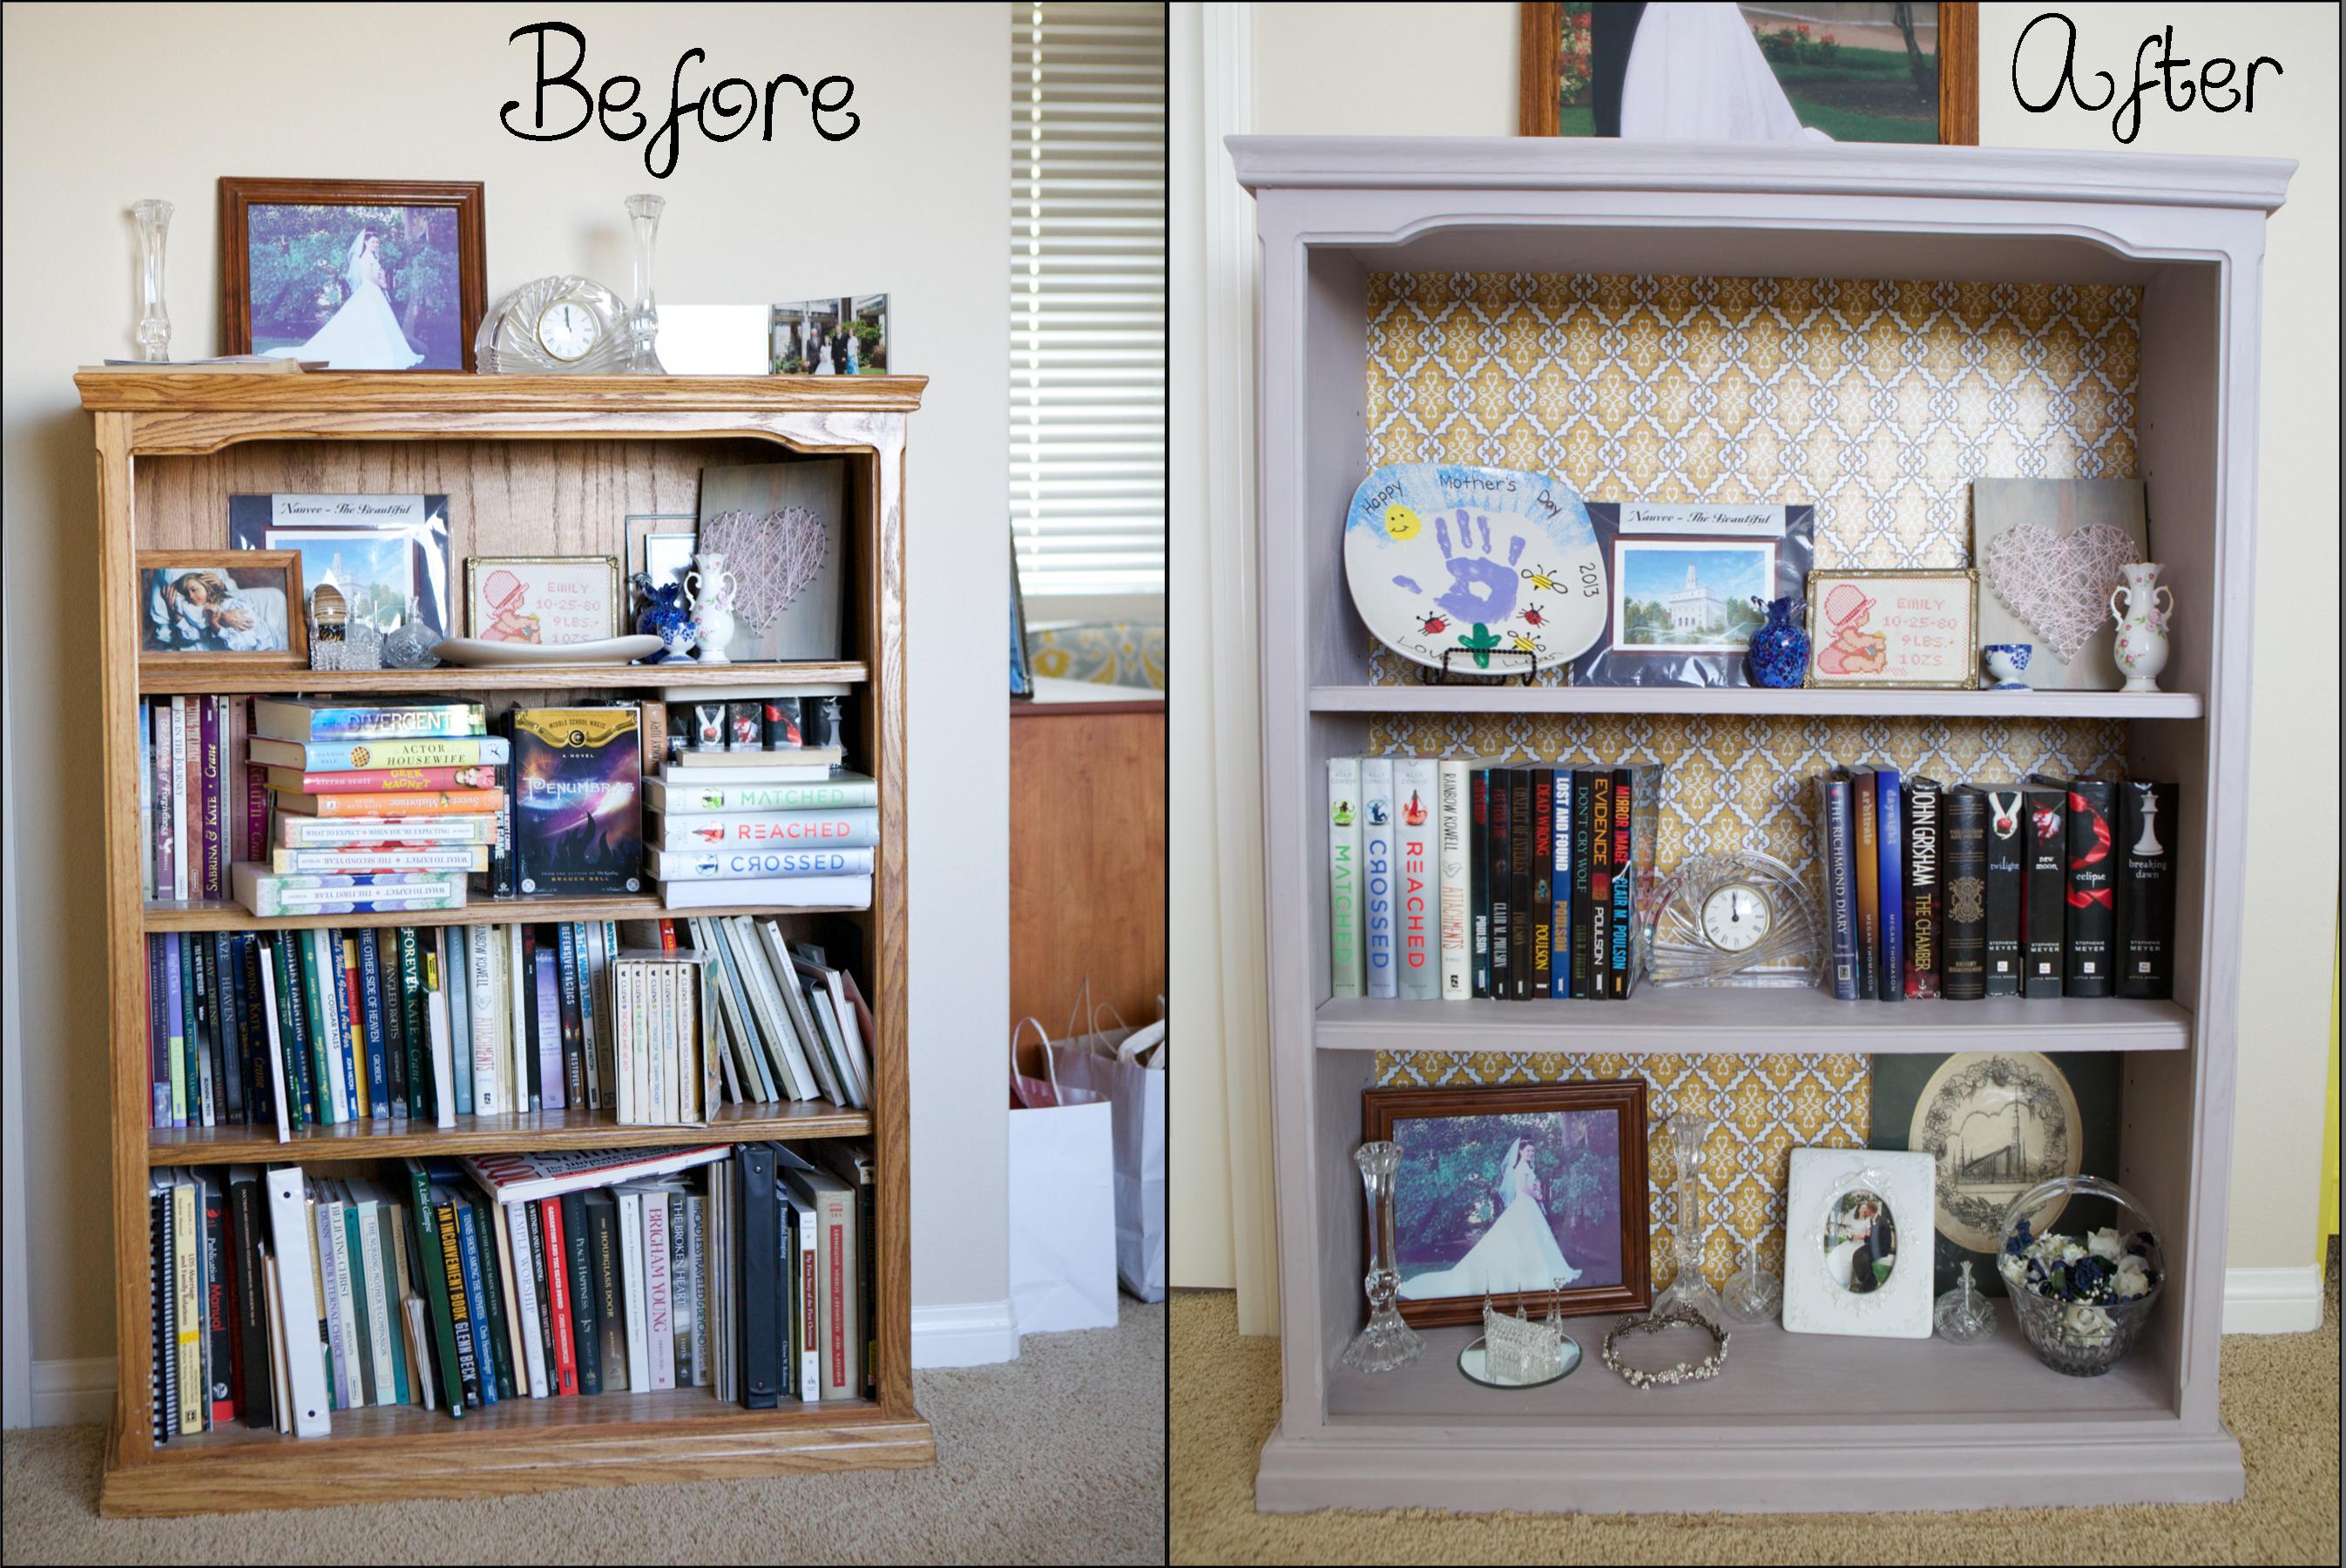 painting a bookshelf